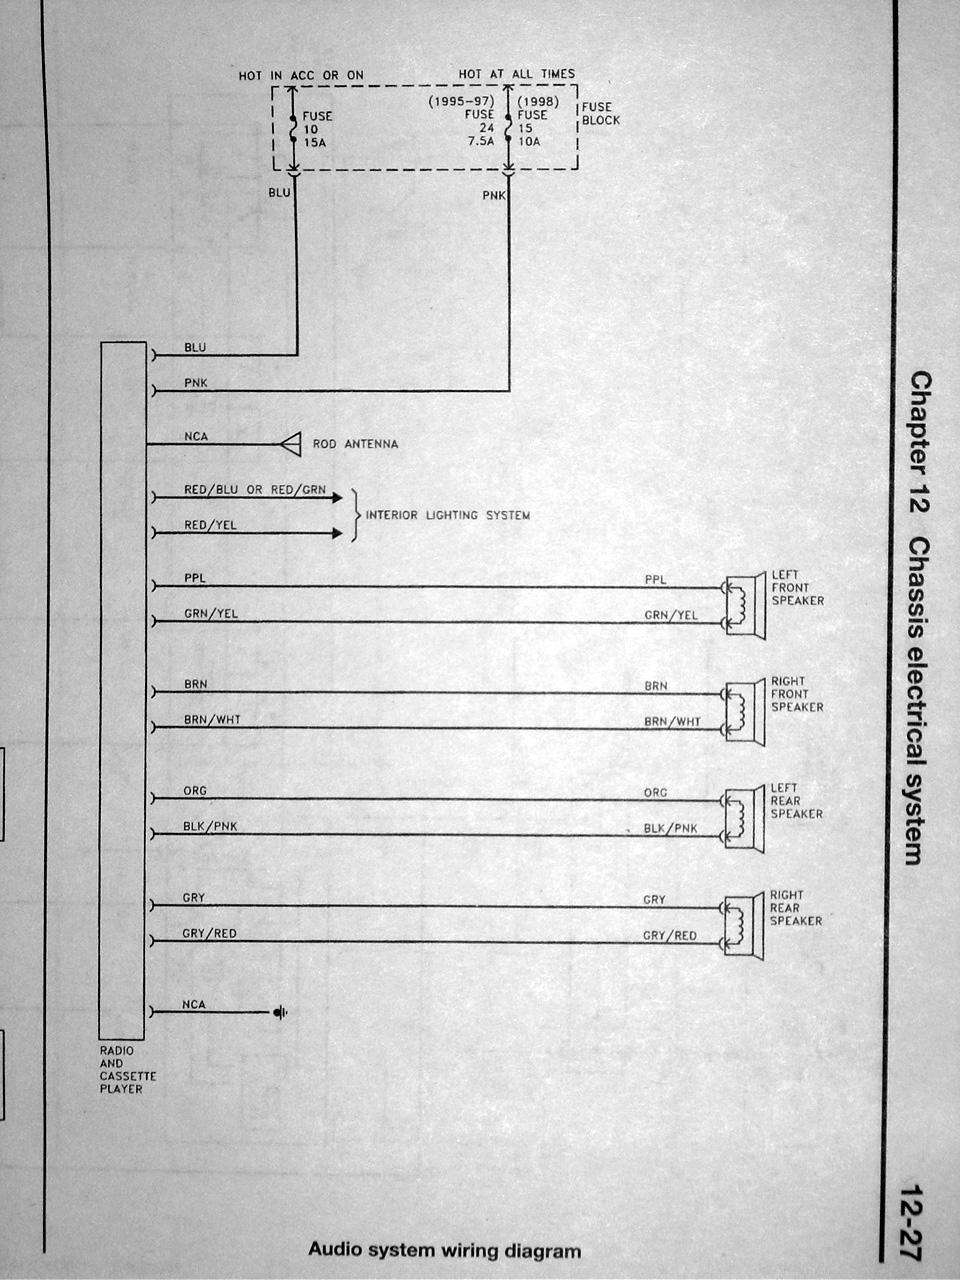 DSC01849?resize=665%2C887 2005 altima 2 5 s radio wiring illumination interior lighting 1998 nissan altima radio wiring diagram at n-0.co